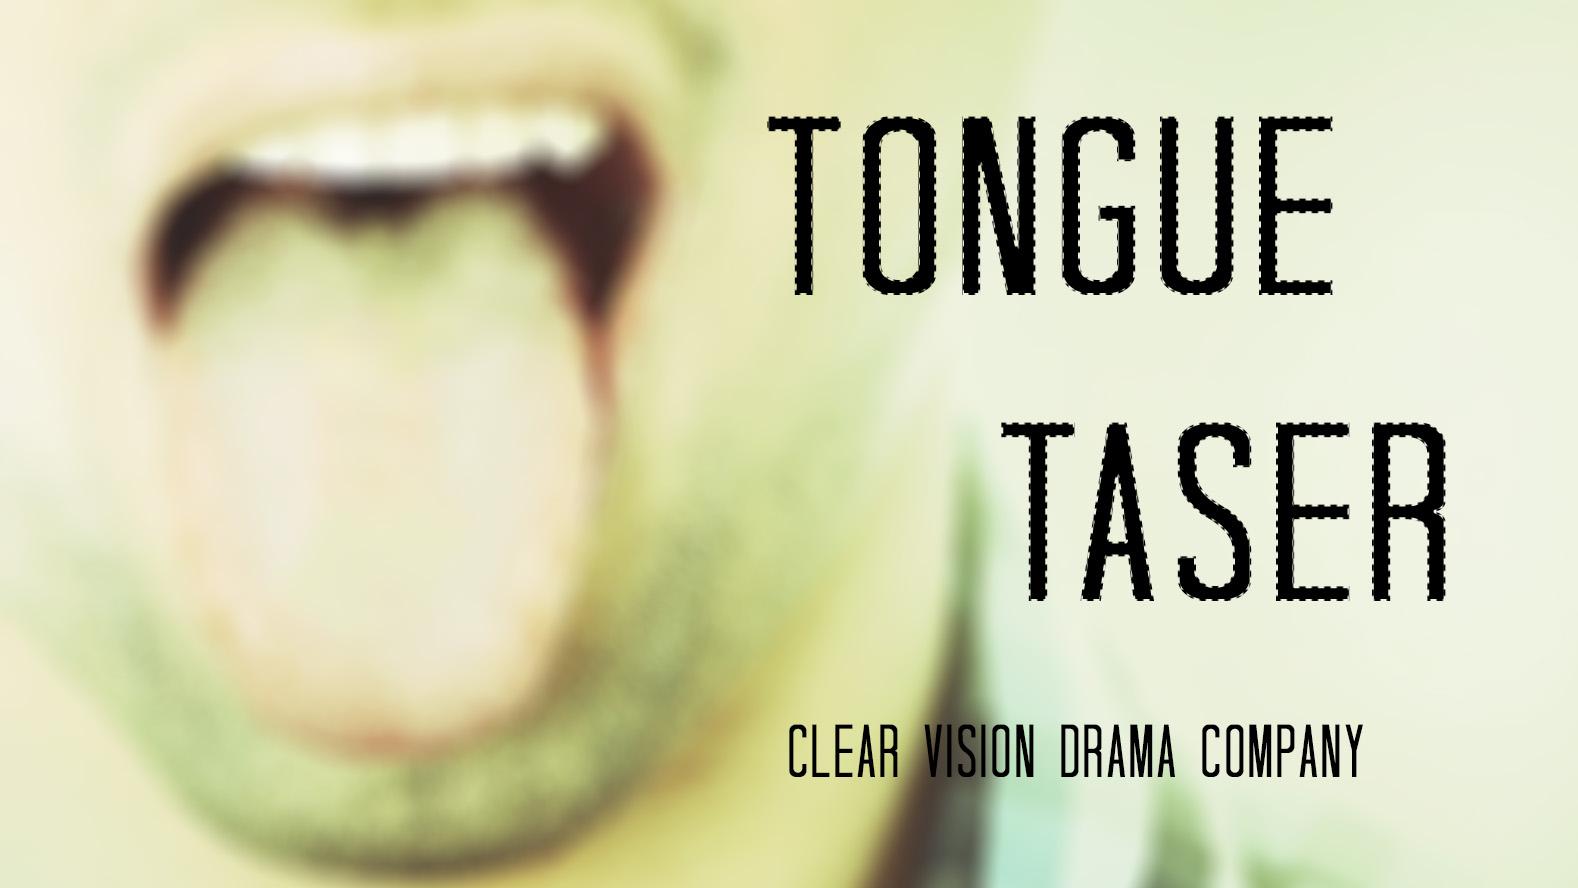 Tonguetaser.jpg